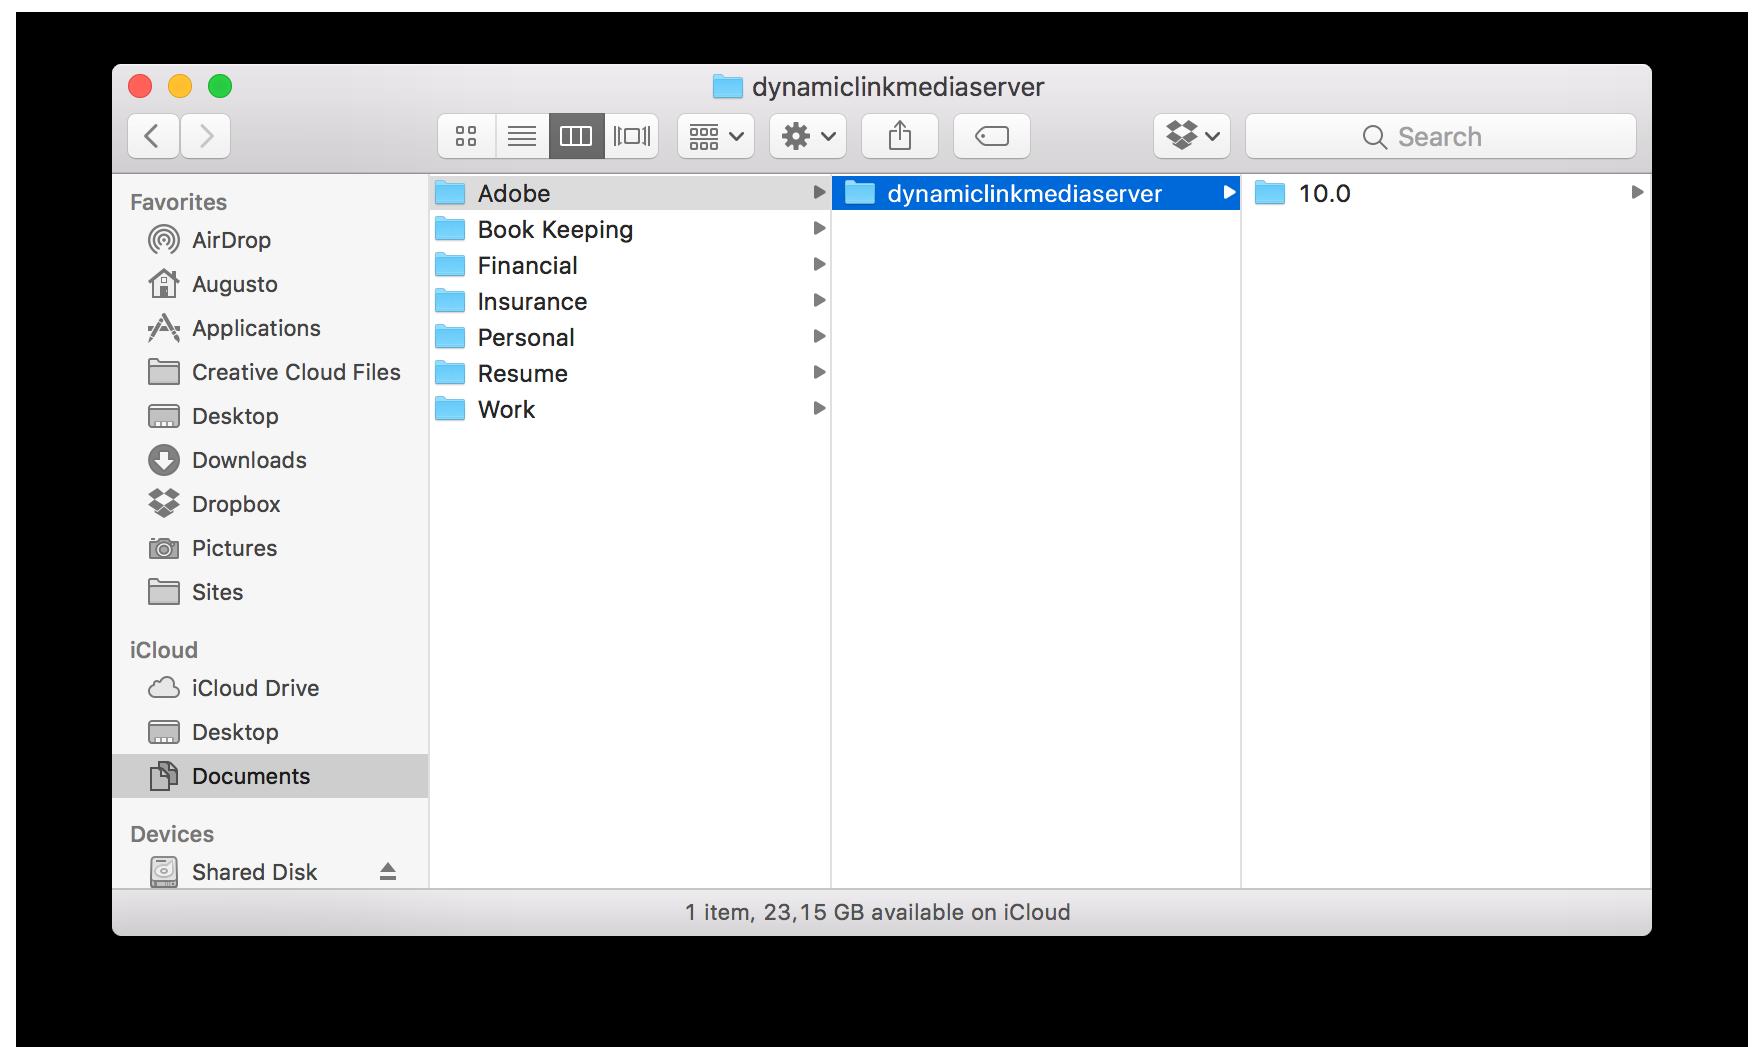 Remove dynamiclinkmediaserver folder created by Adobe apps